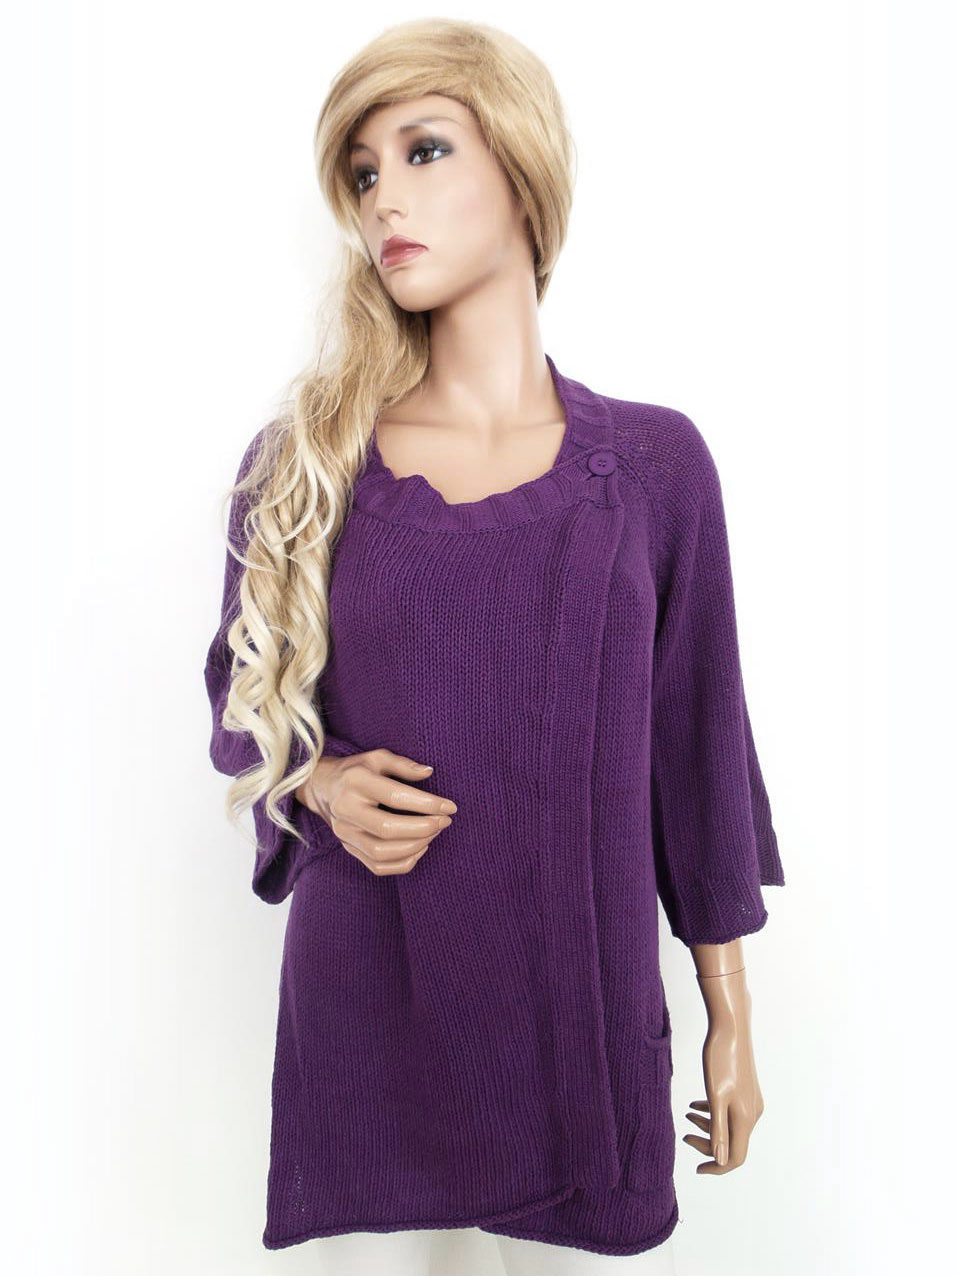 gudrun sj d n gr e l tunika tunic pullover bestickt baumwolle 100 lila ebay. Black Bedroom Furniture Sets. Home Design Ideas